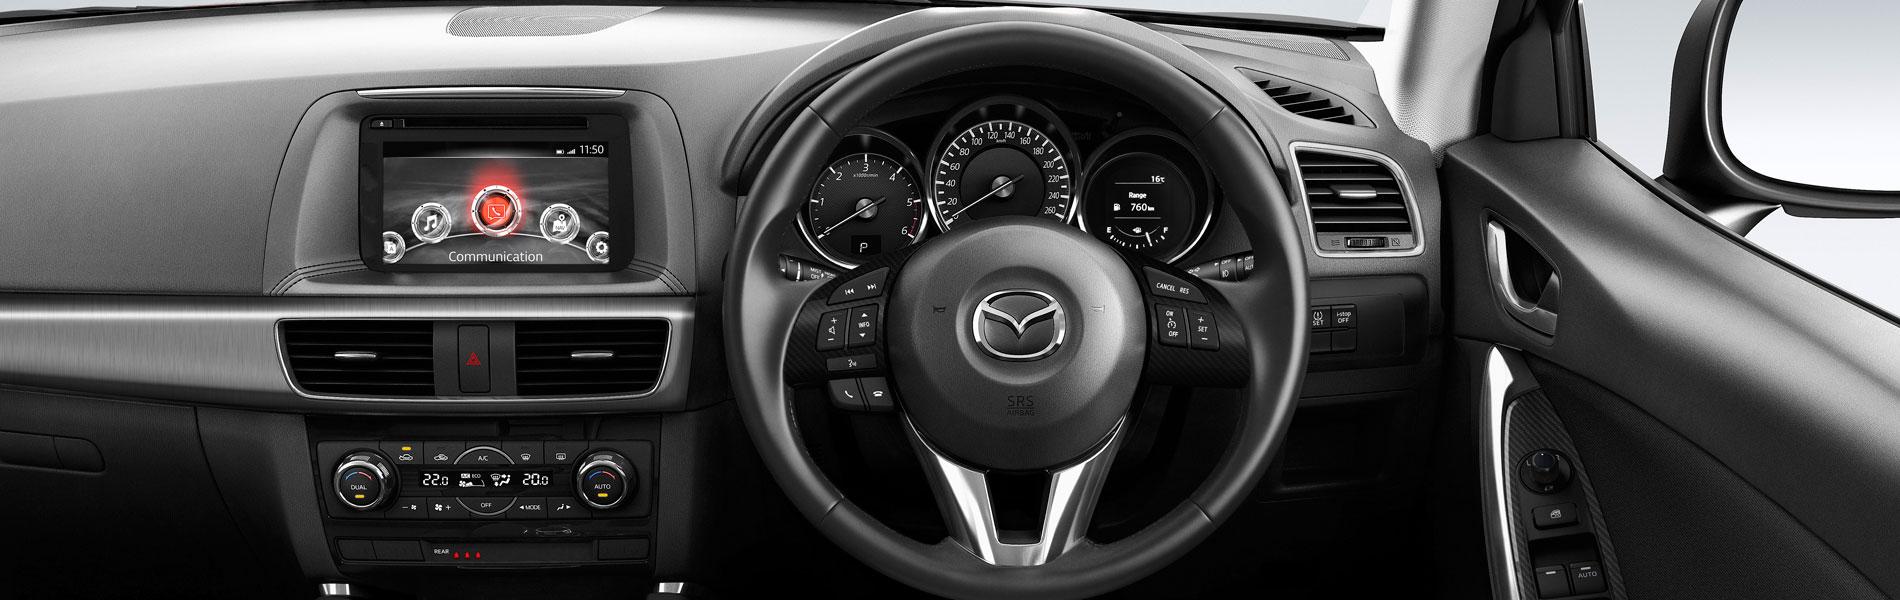 Mazda Next-Gen CX-5 Image 5